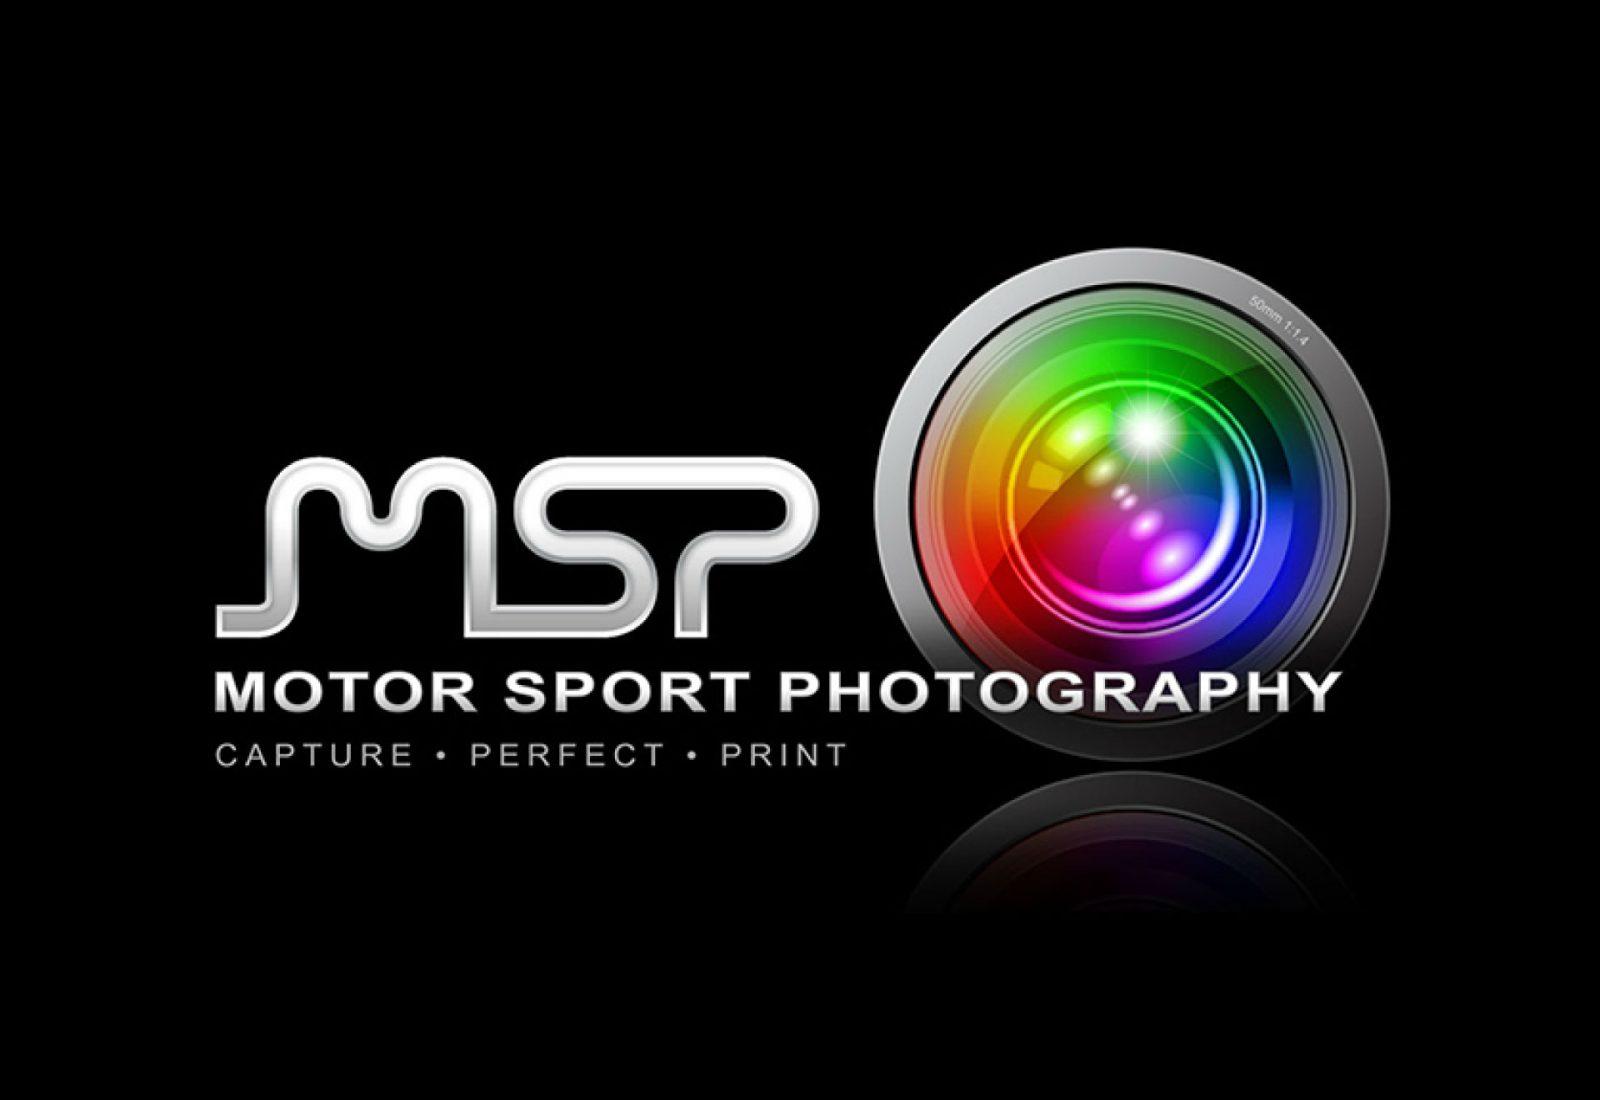 Motor Sport Photography branding